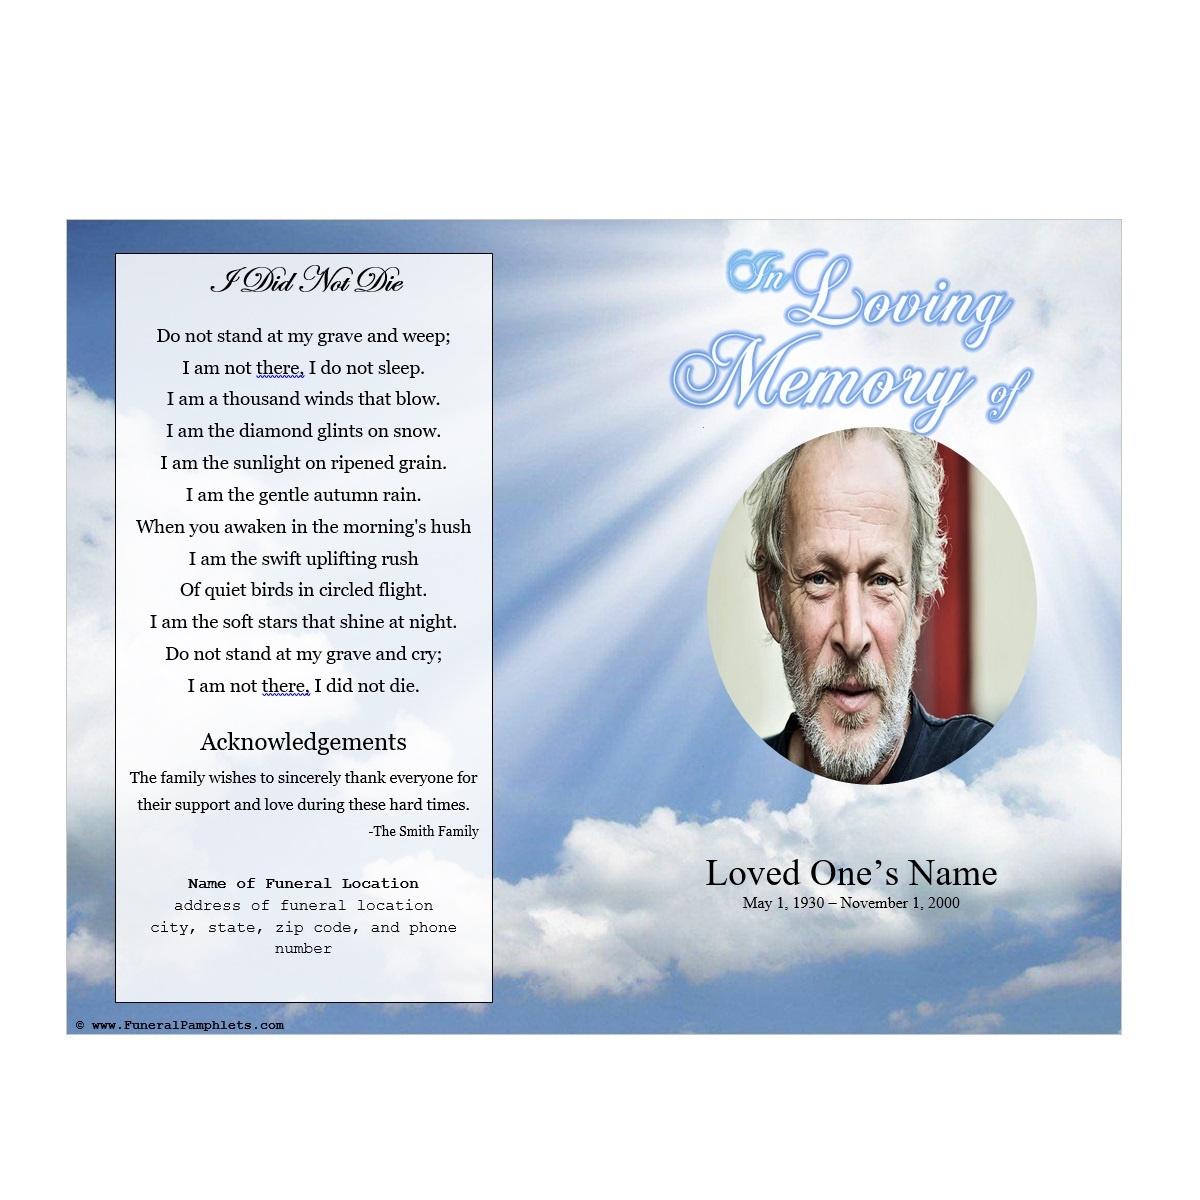 Sky Memorial Program | Funeral Pamphlets - Free Printable Funeral Programs